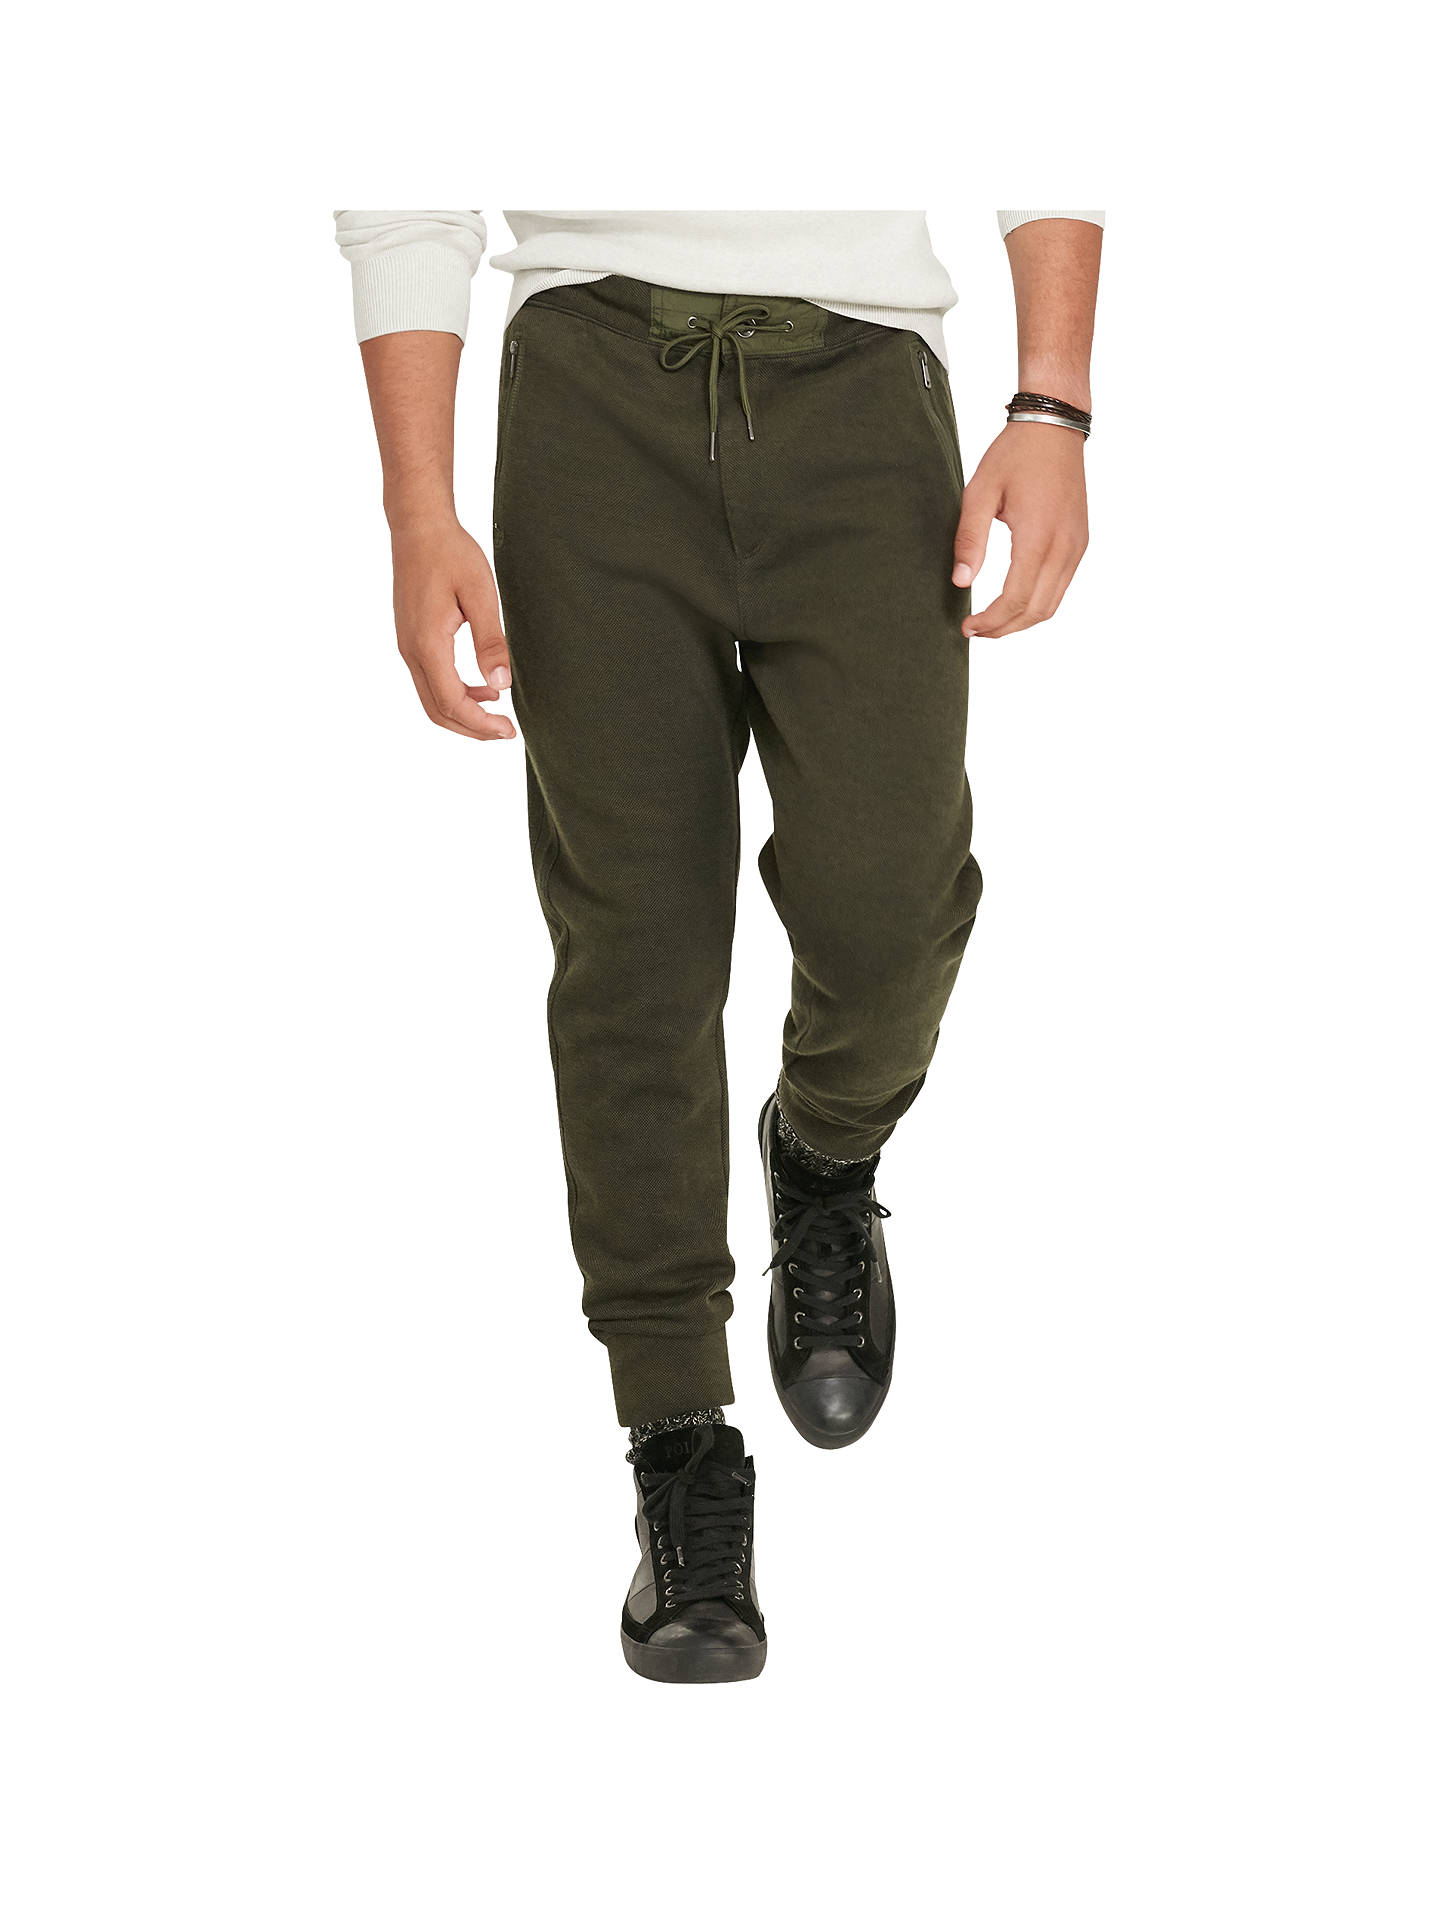 7507e09ee75 Buy Polo Ralph Lauren Birdseye Cotton-Blend Jogging Bottoms